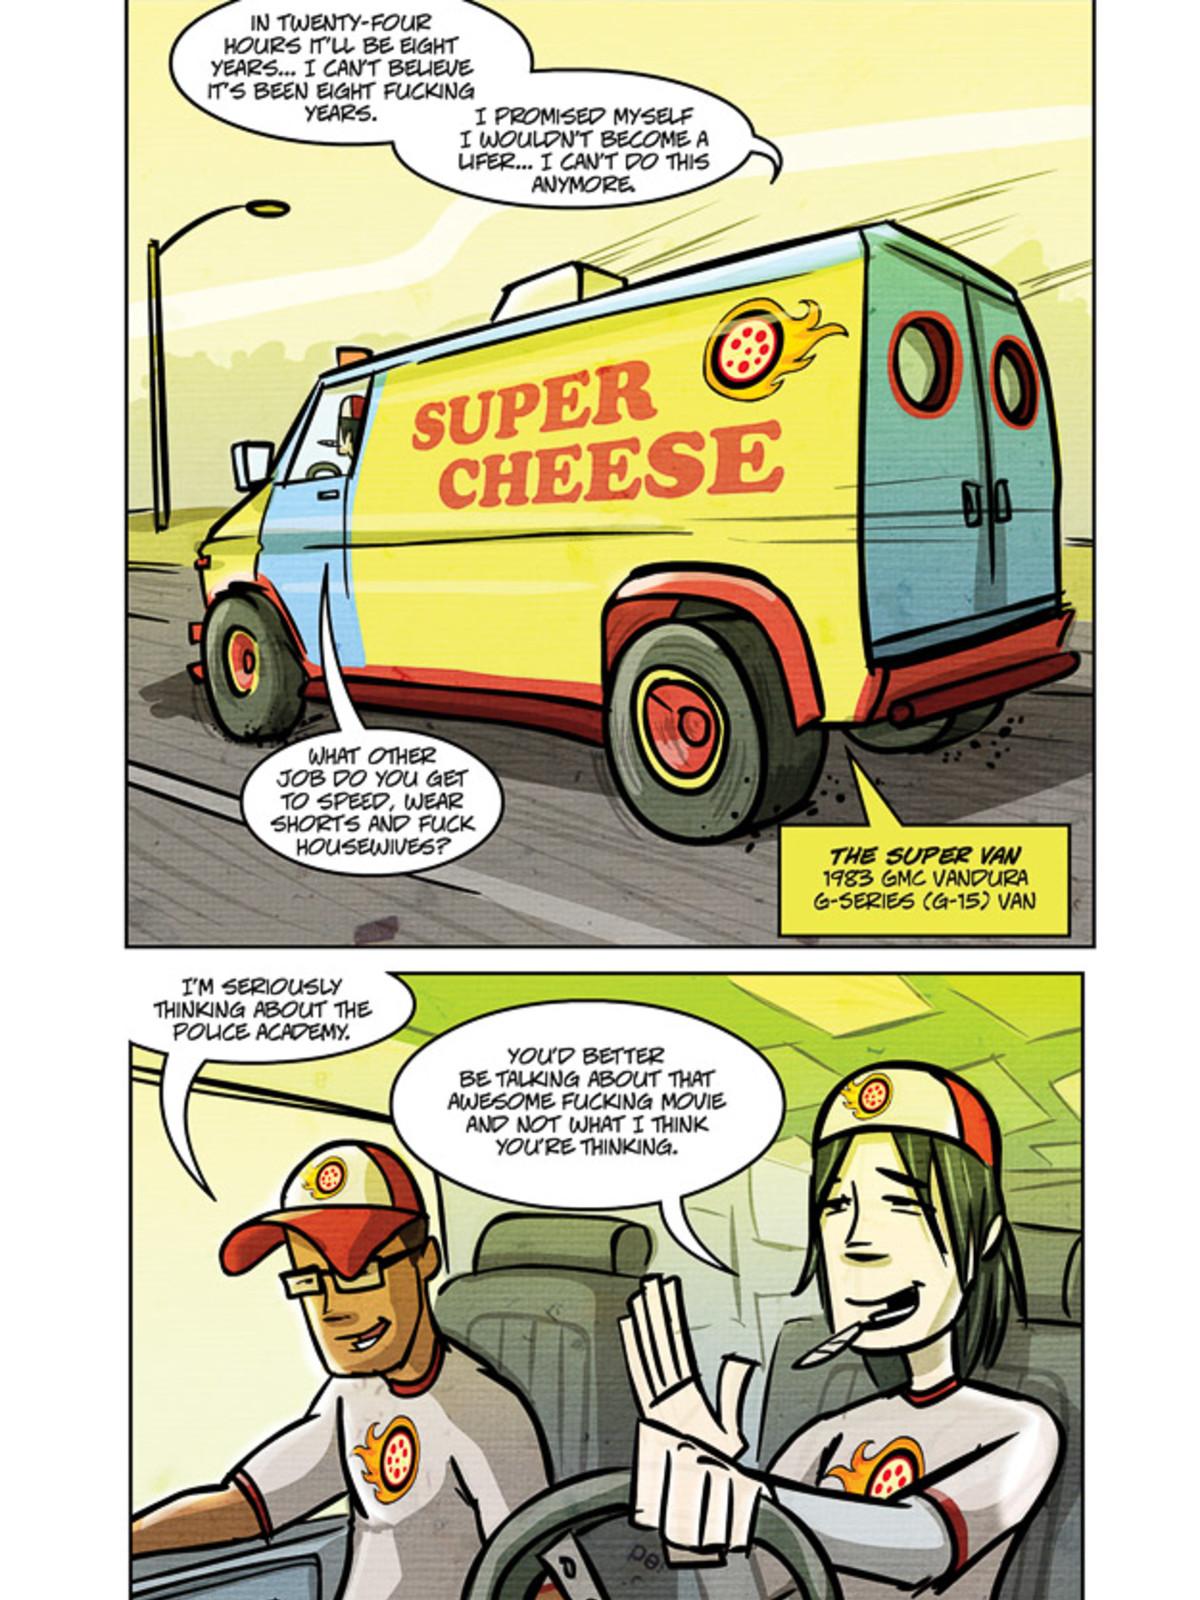 News_Sarah Rufca_Yehudi Mercado_comics_Feb 10